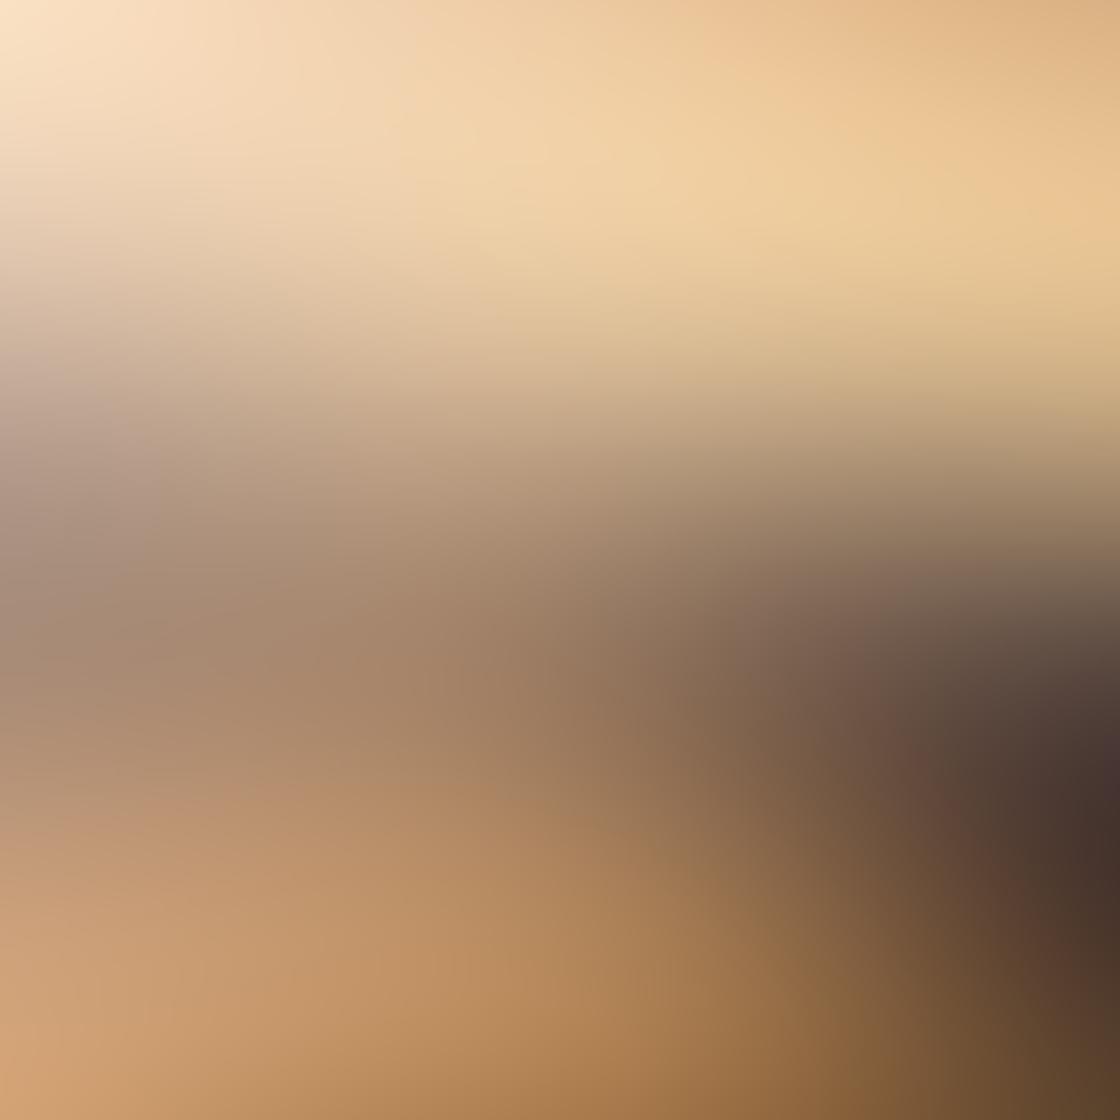 iPhone Silhouette Photos 28